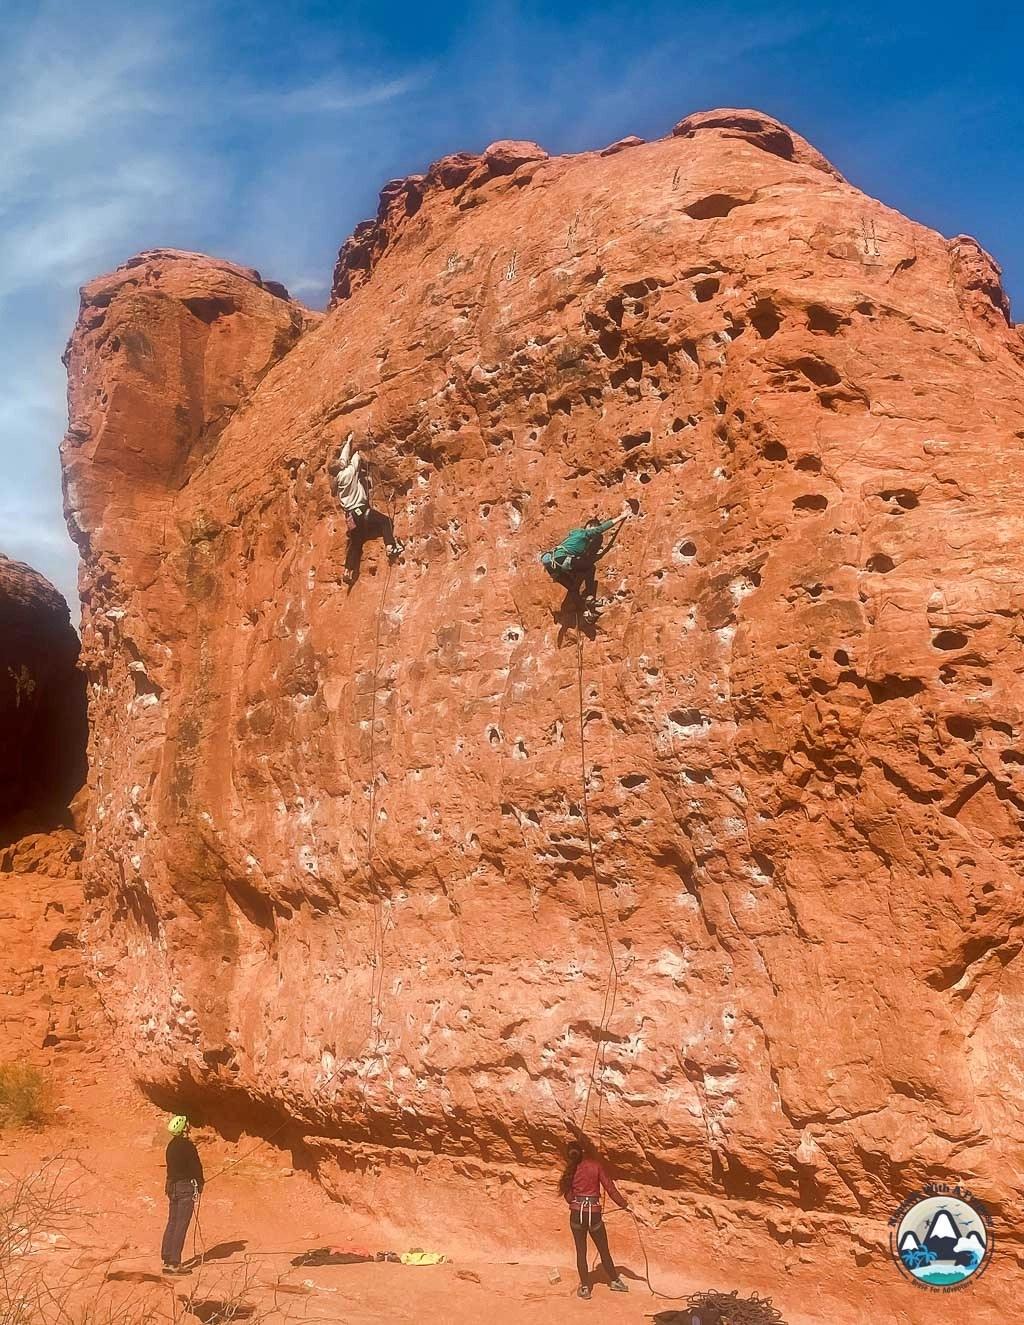 Climbing Dirtbag 10a at Chuckwalla, St George